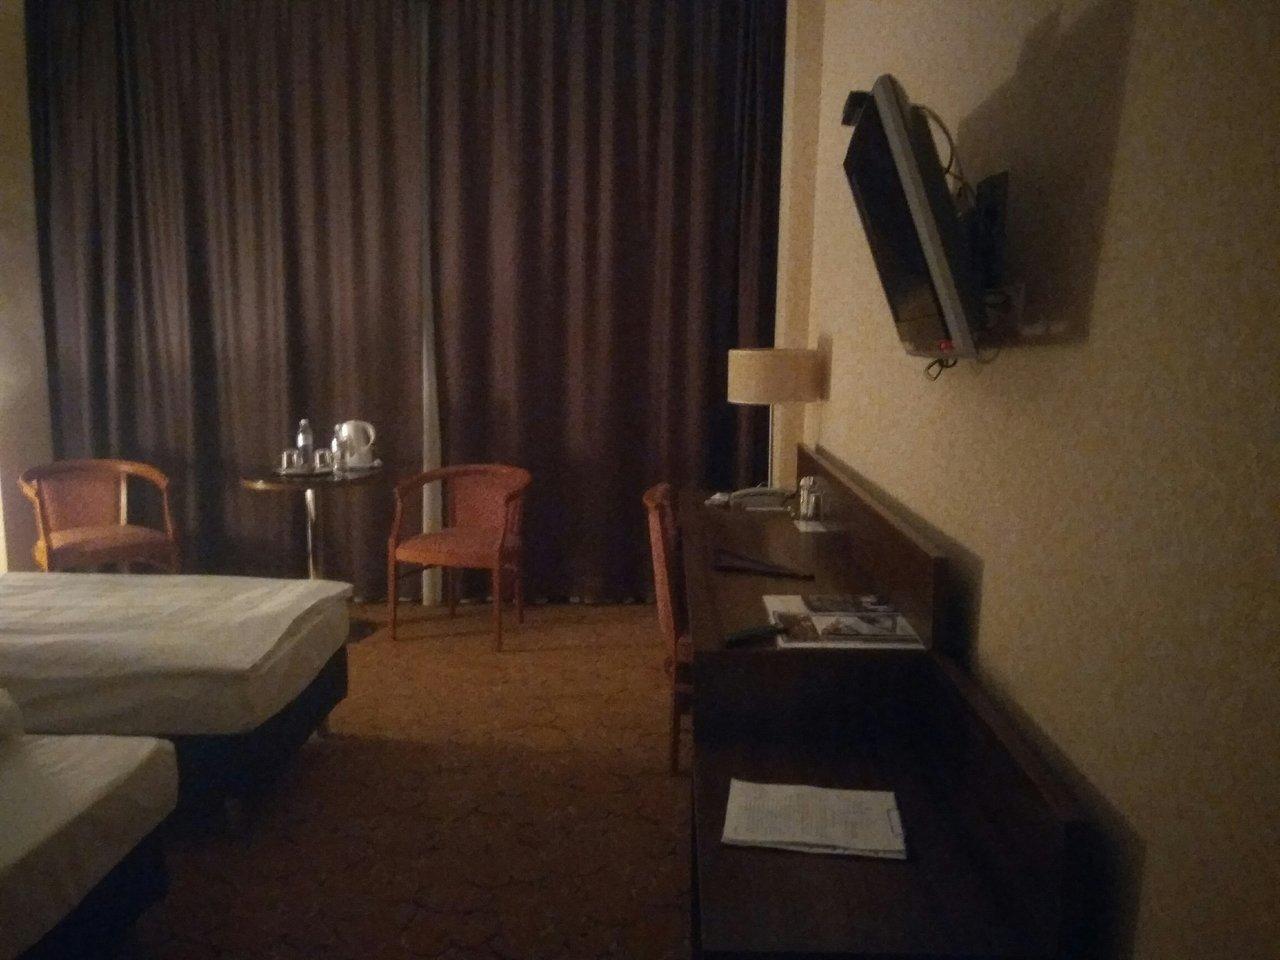 Restaurant Maximilian (Rostov-on-Don). Short review